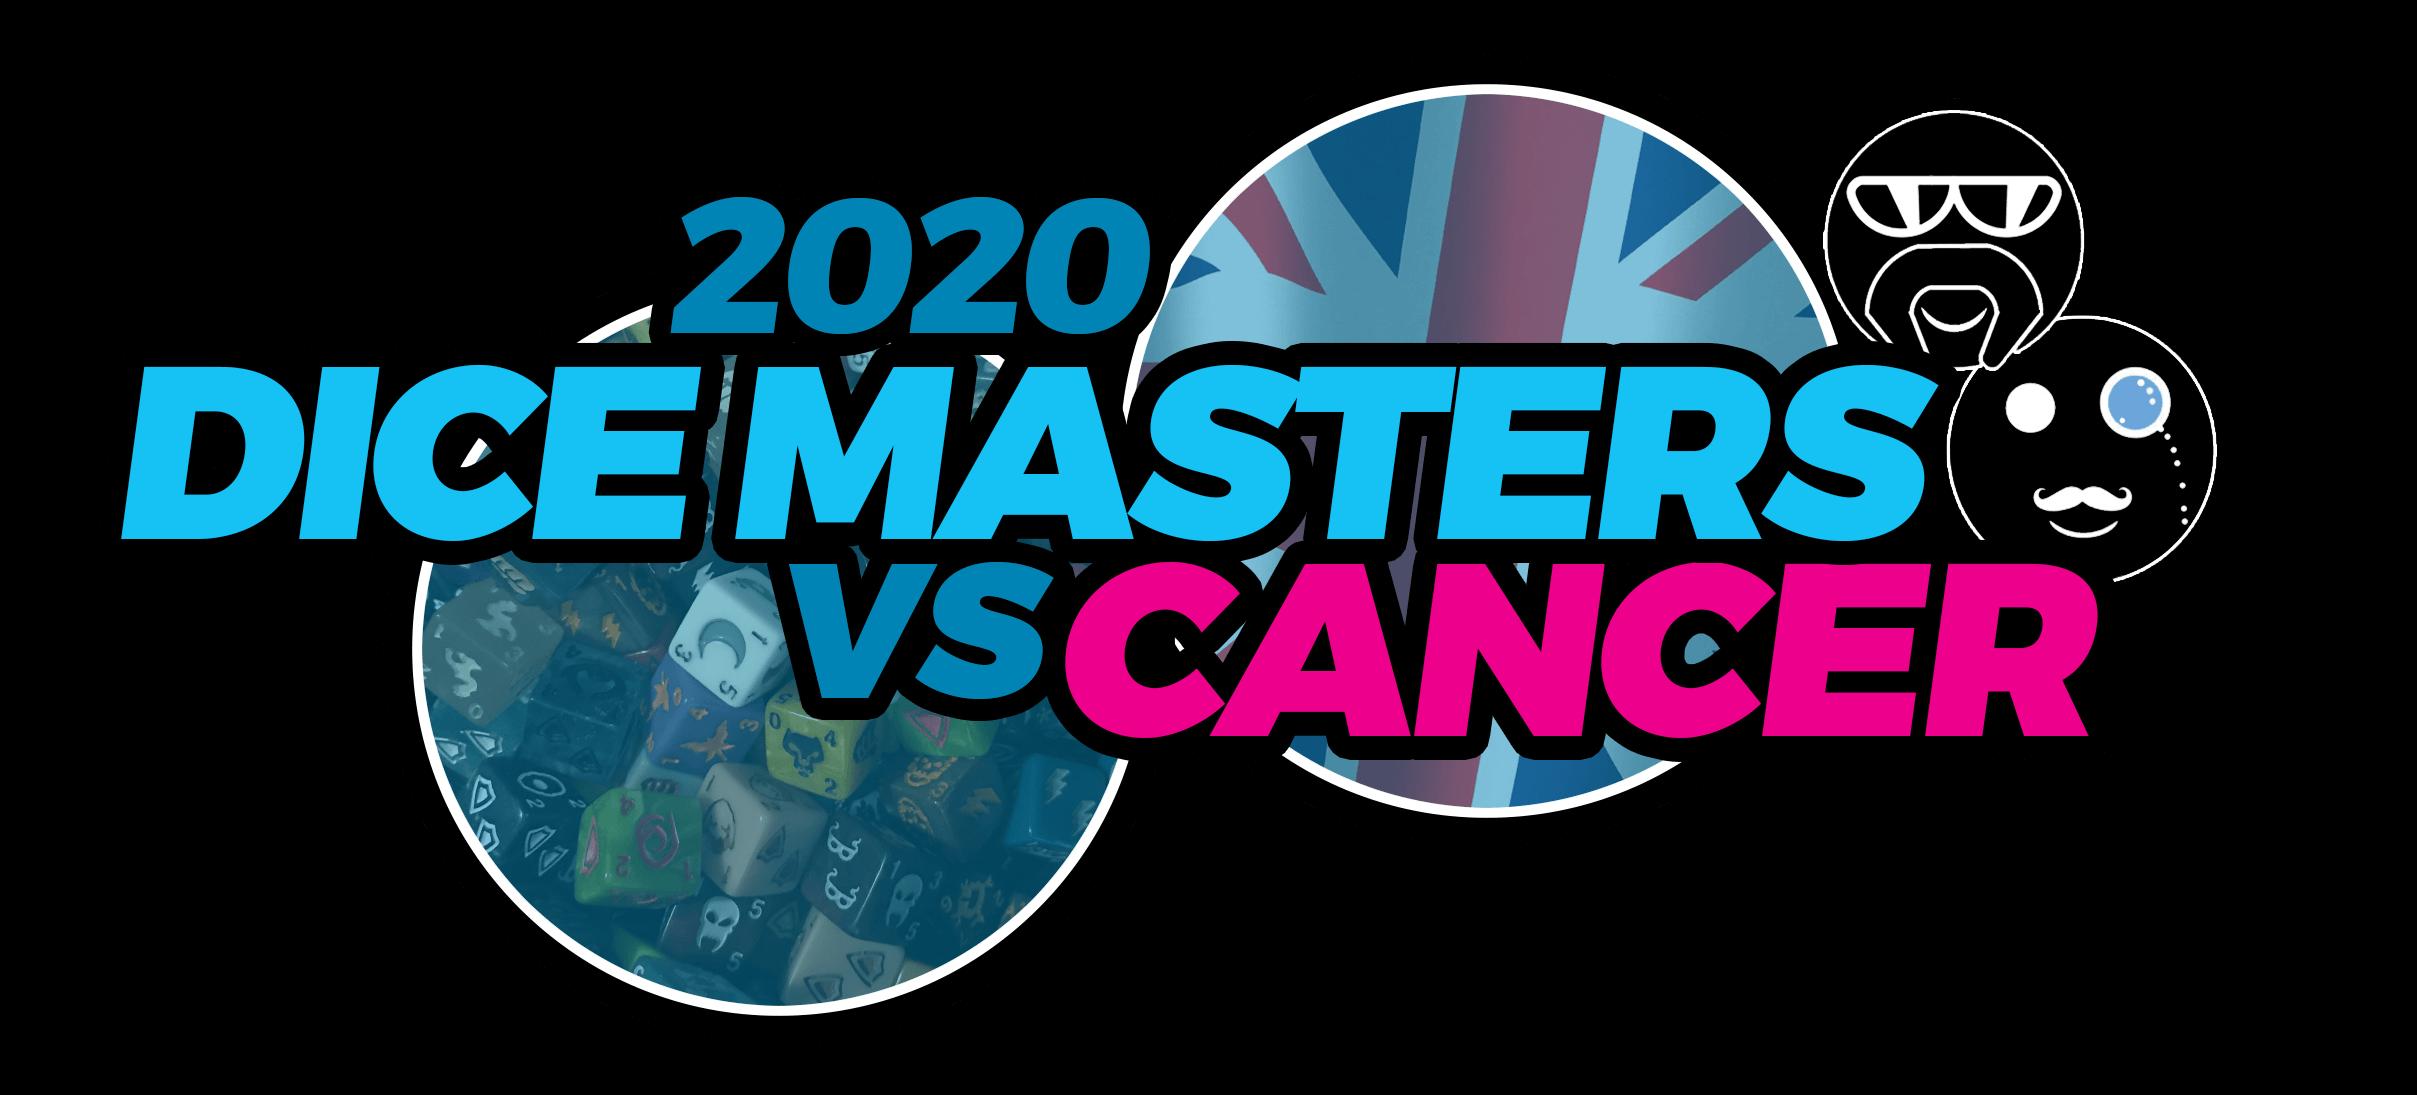 Dice Masters Vs Cancer Logo 2020